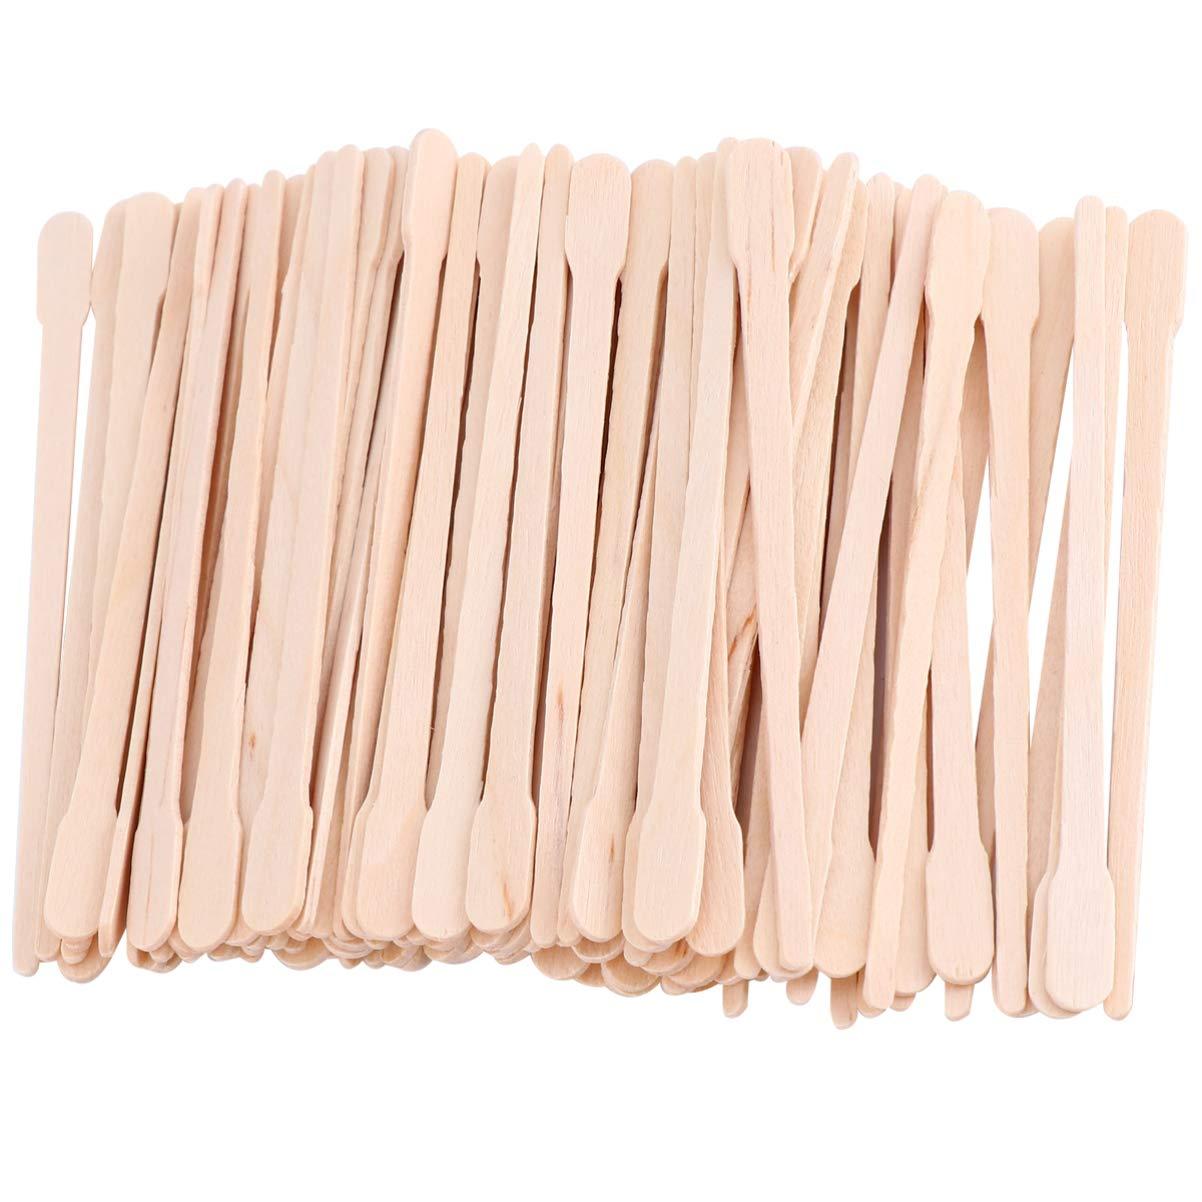 SOLUSTRE 600pcs Wood Wax Spatulas Ranking TOP1 Waxing Max 49% OFF Sticks Applicators